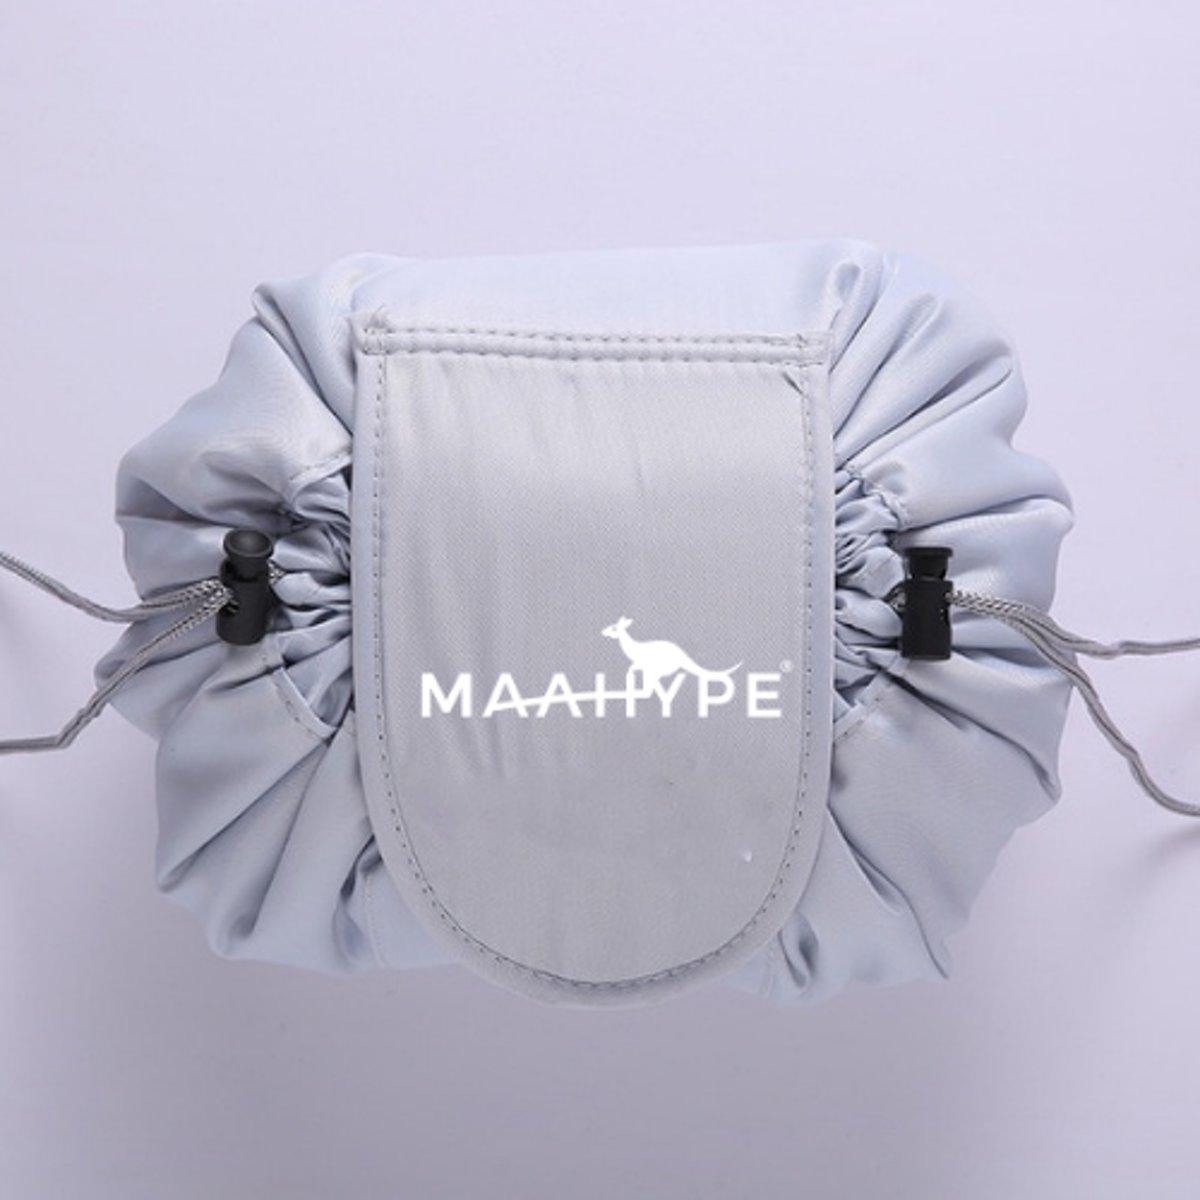 MaaHype Make-up organiser - Makeup opbergen - Accesoires organiser - Opbergsysteem - Reis toilettas - Lichtgrijs kopen